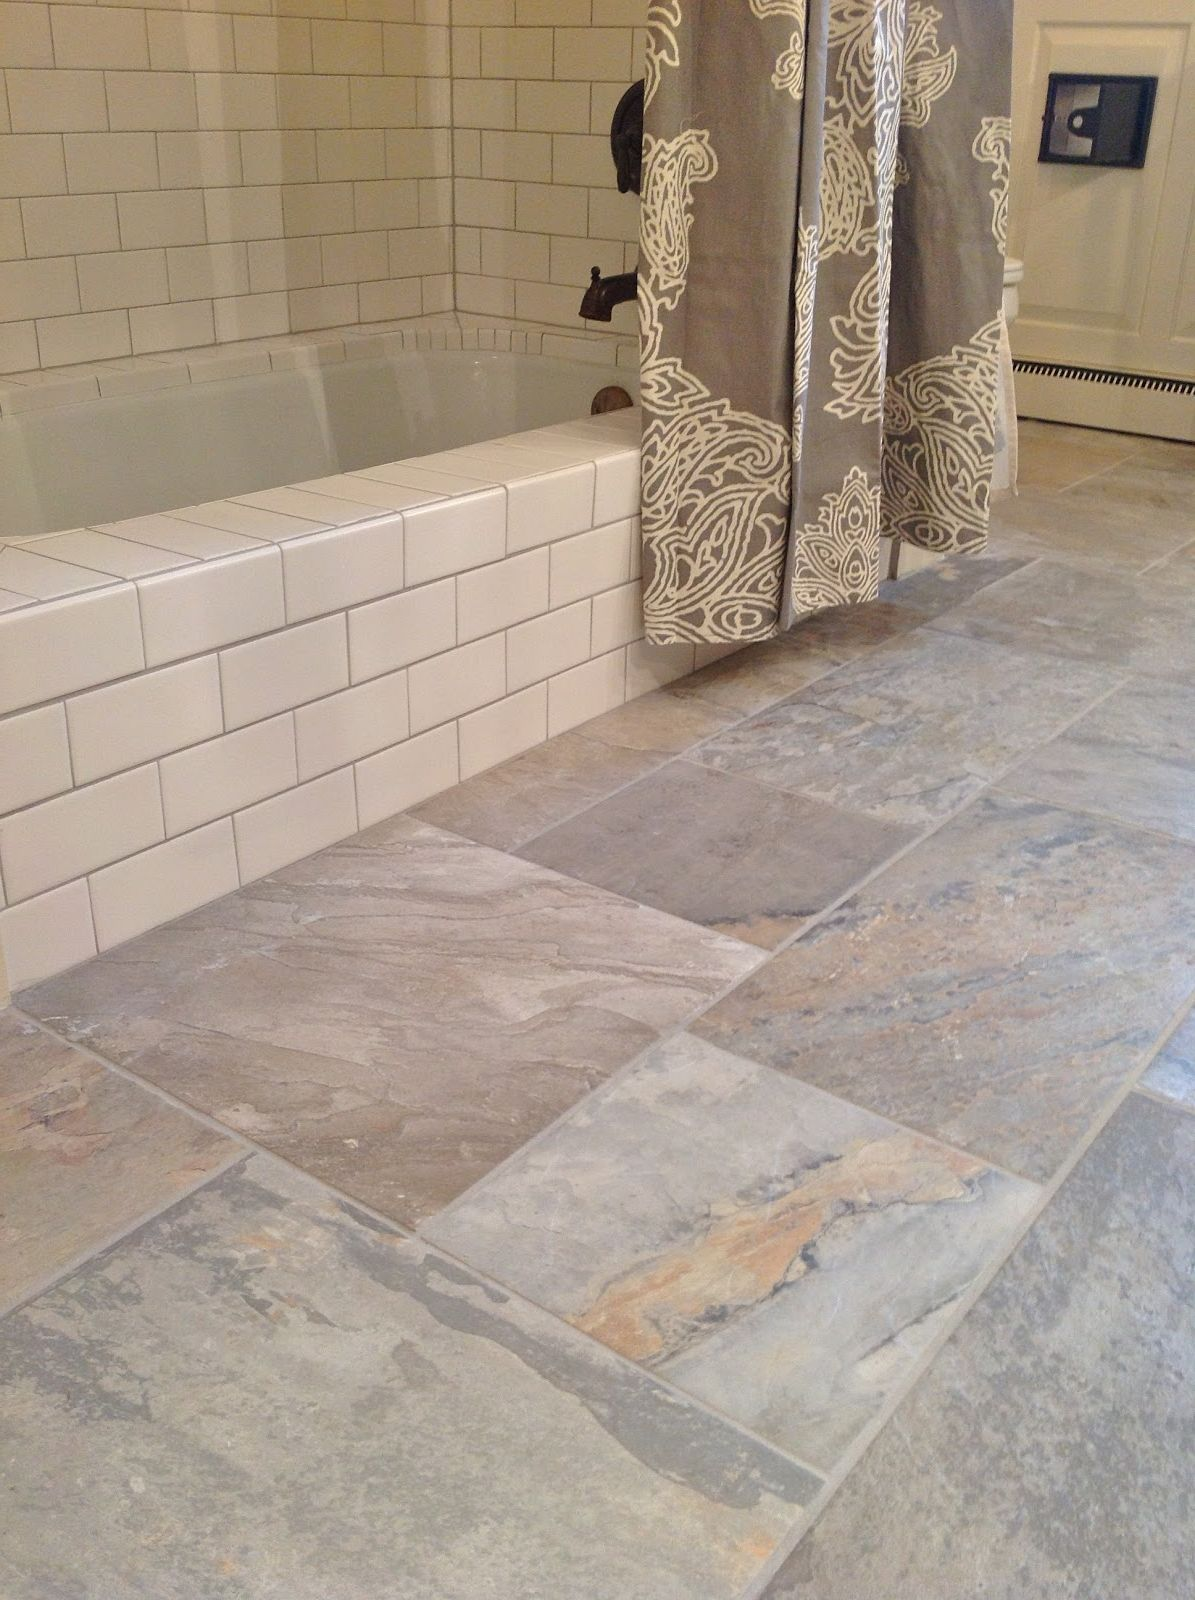 30 good ideas and pictures classic bathroom floor tile ... on Farmhouse Tile  id=42883